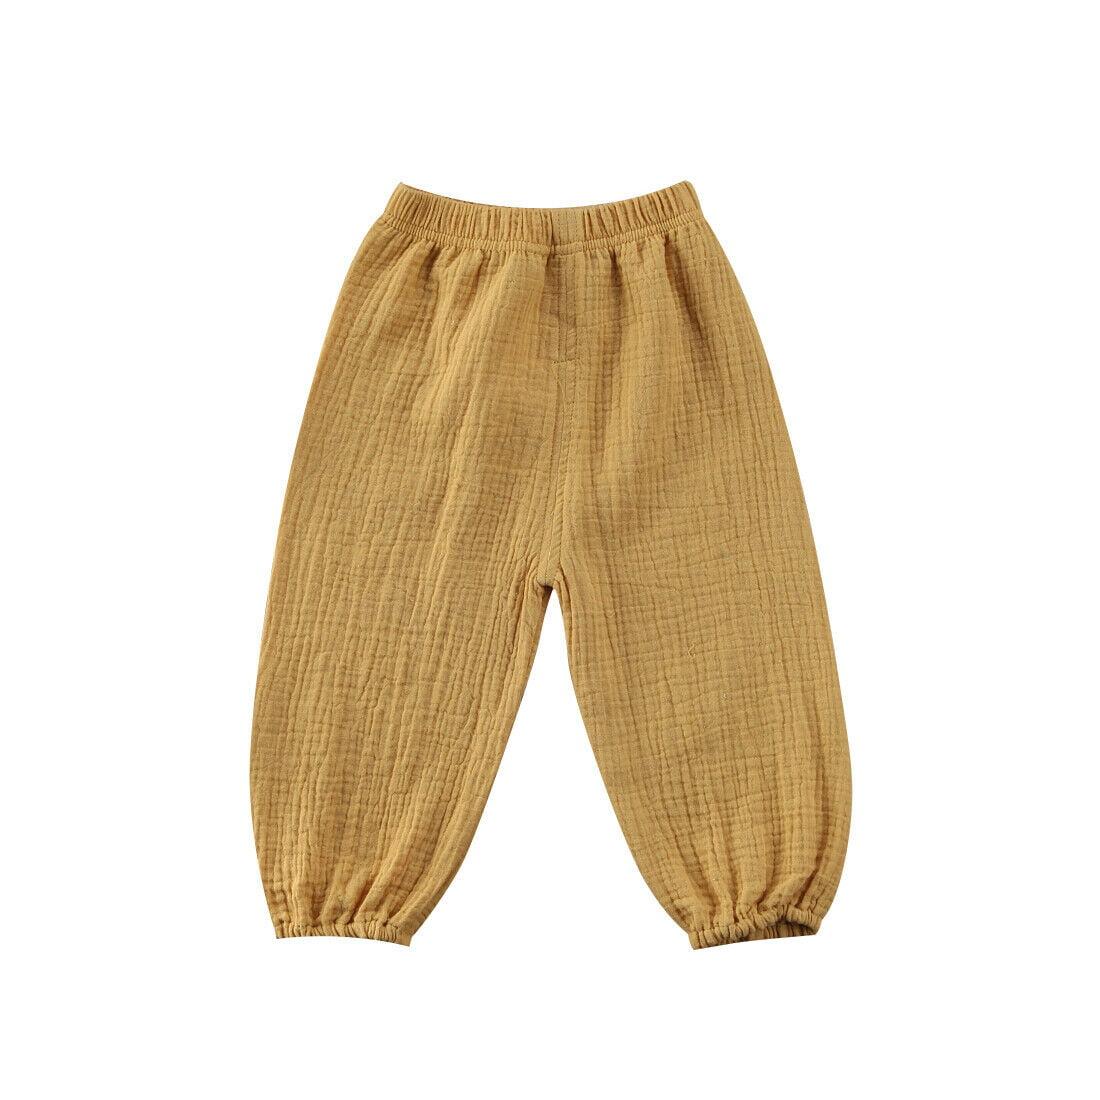 Kids Girls Boys Baby Trousers Harem Pants Casual Cotton Dance Leggings Bloomers